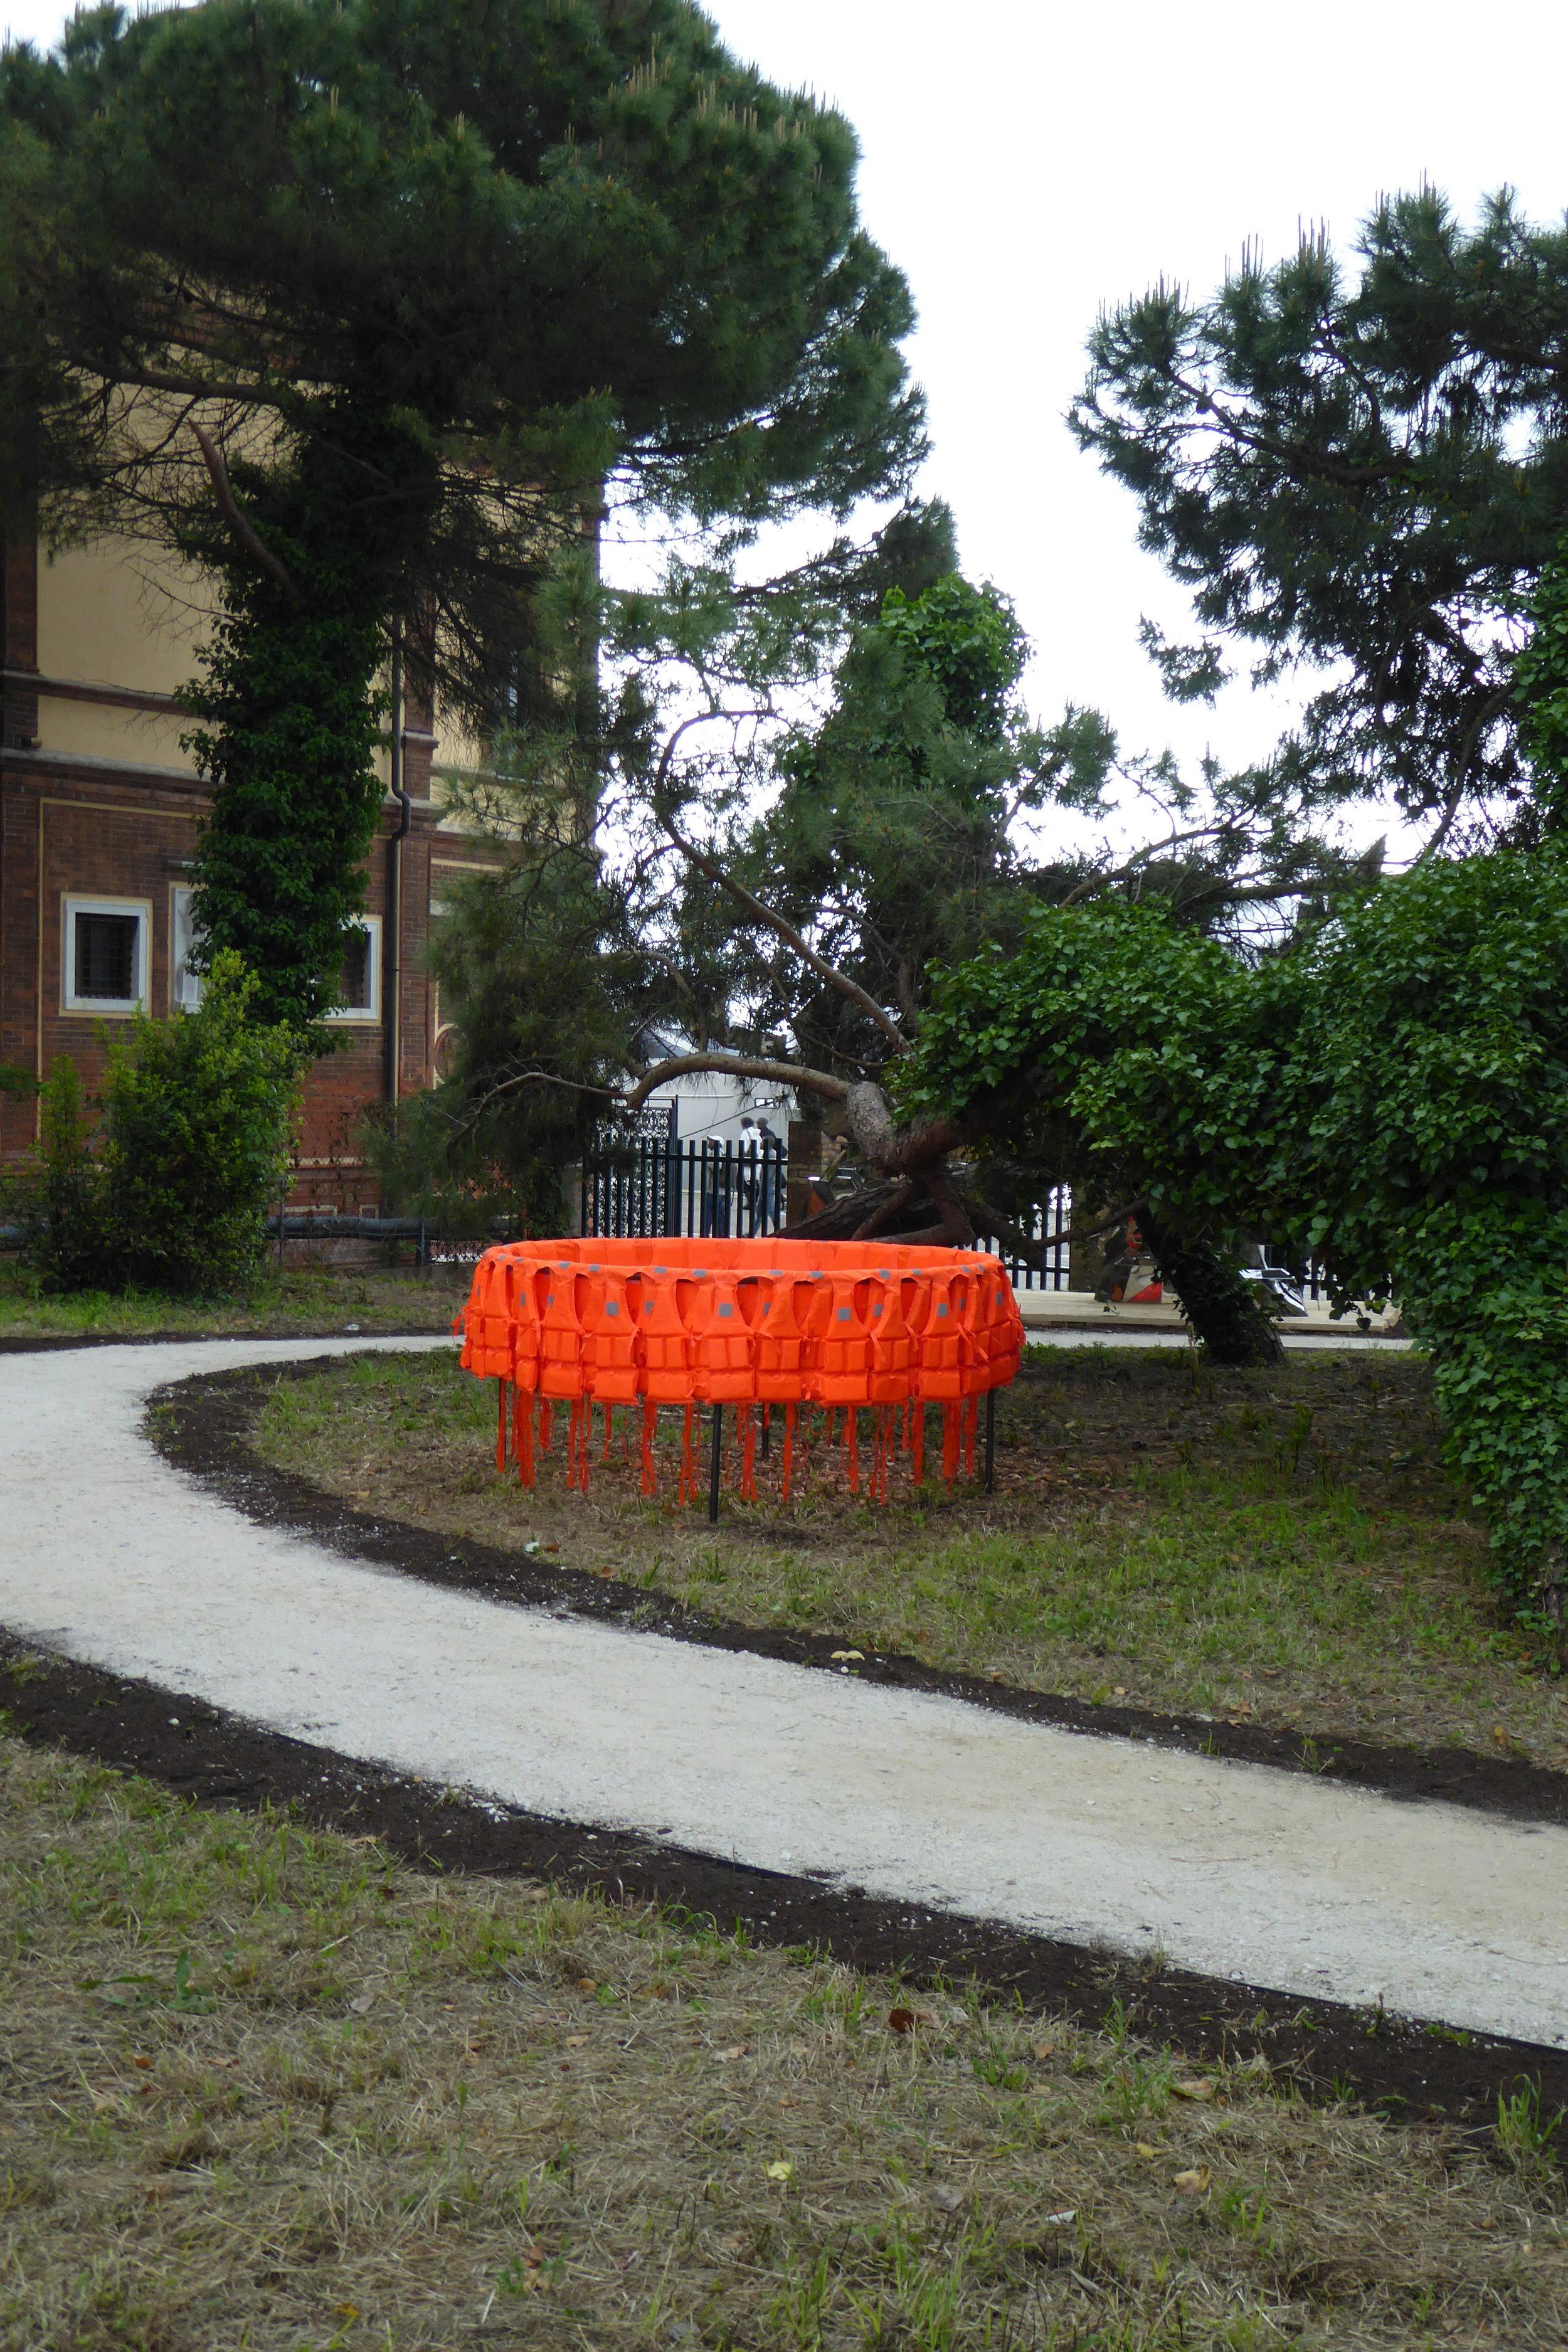 Déplacement (Smuggling Pod) 2017 / Life-jackets, Steel / 200 cm diameter x 100 cm / Installation Giardini Marinaressa, Venice ITALY